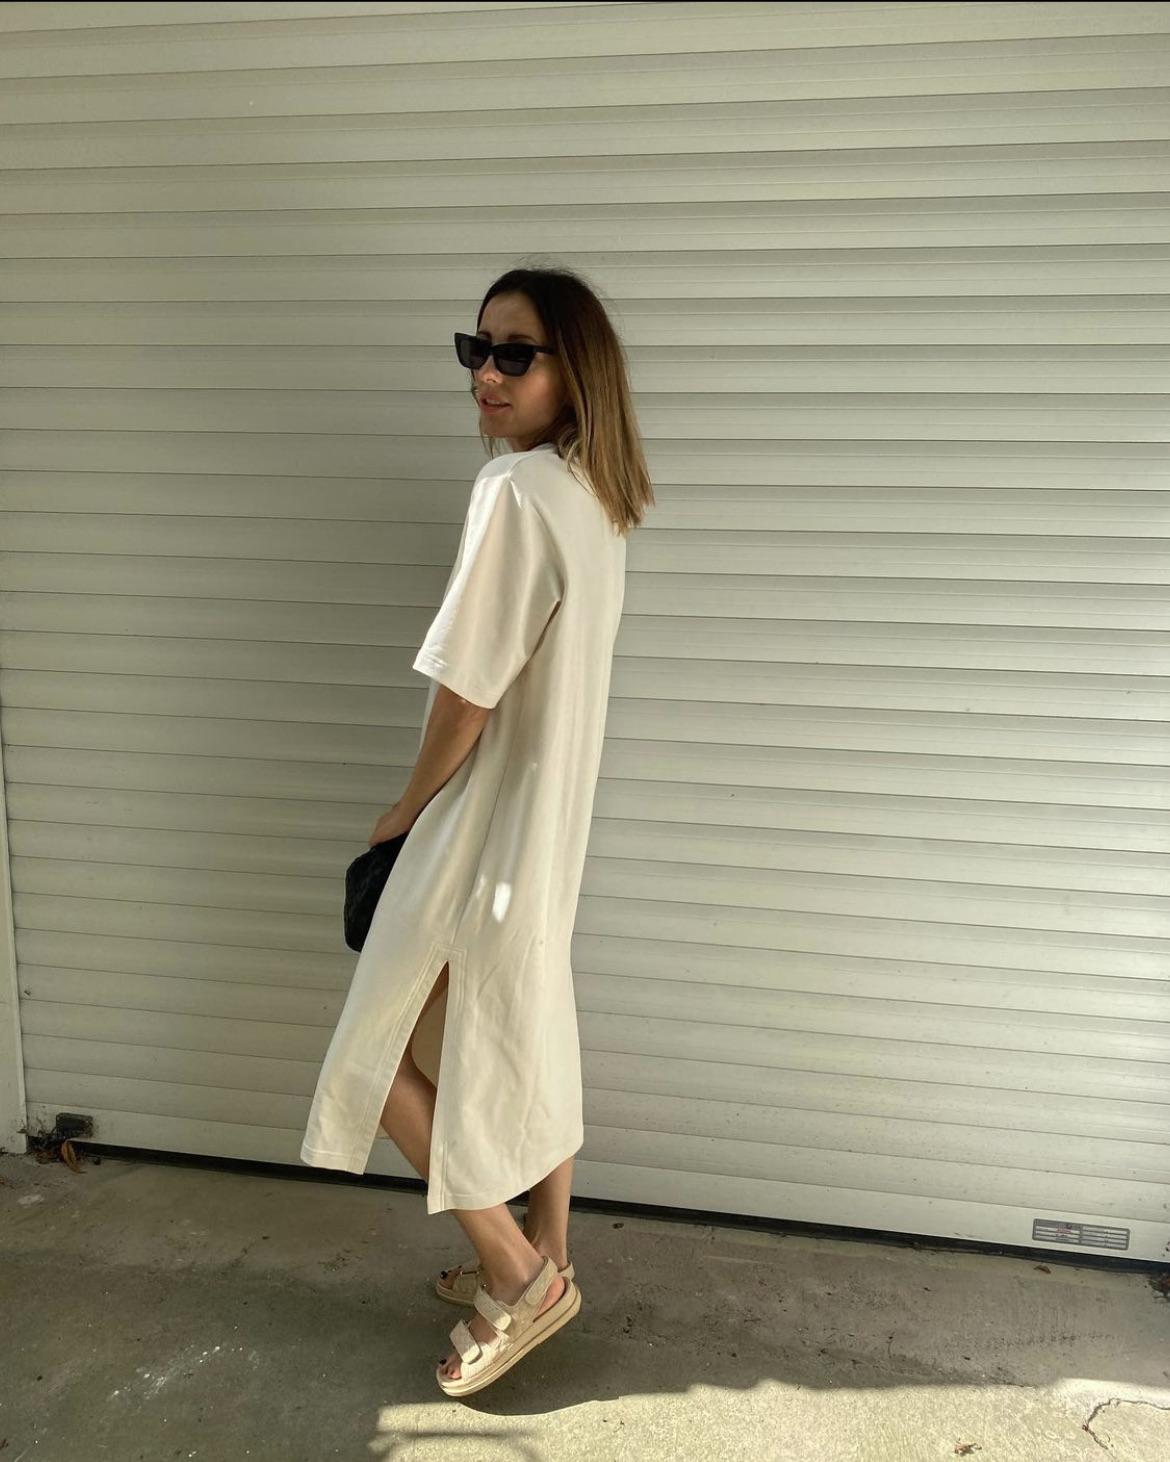 Kleid, Hey Soho, Soho Studios, Minimal Chic, Kleid Jil